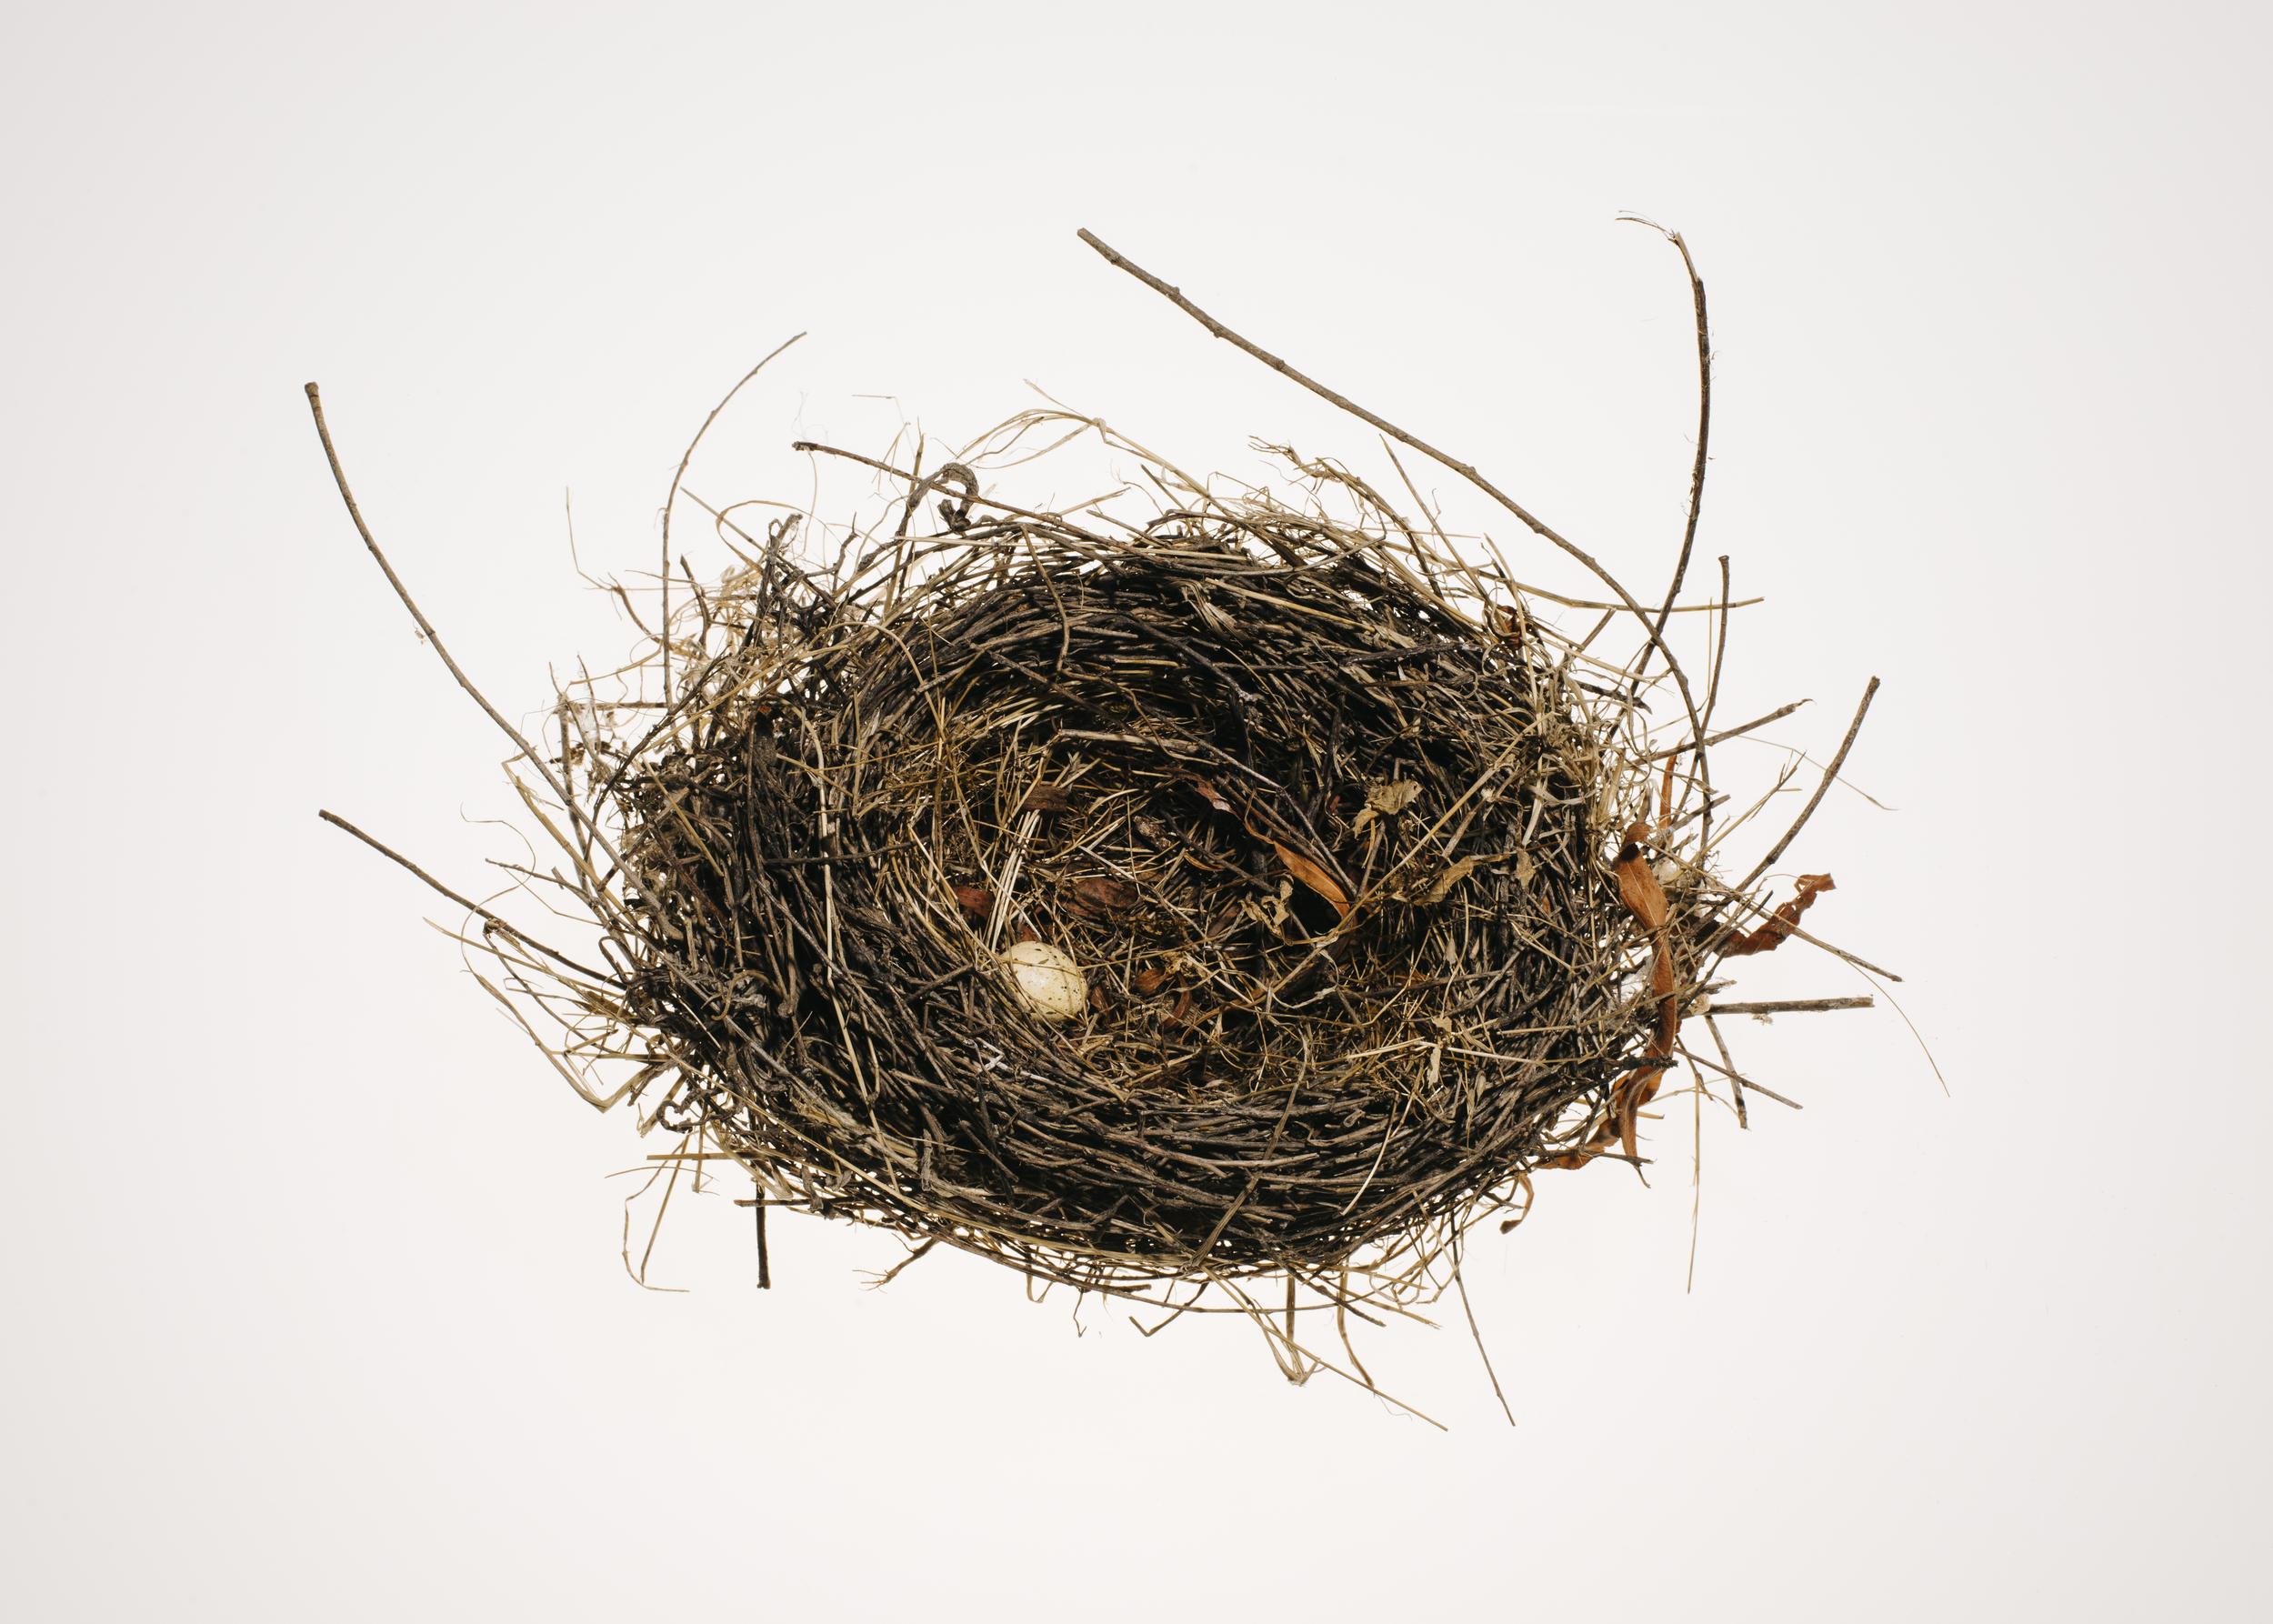 Bird_Nests-0051-2.jpg